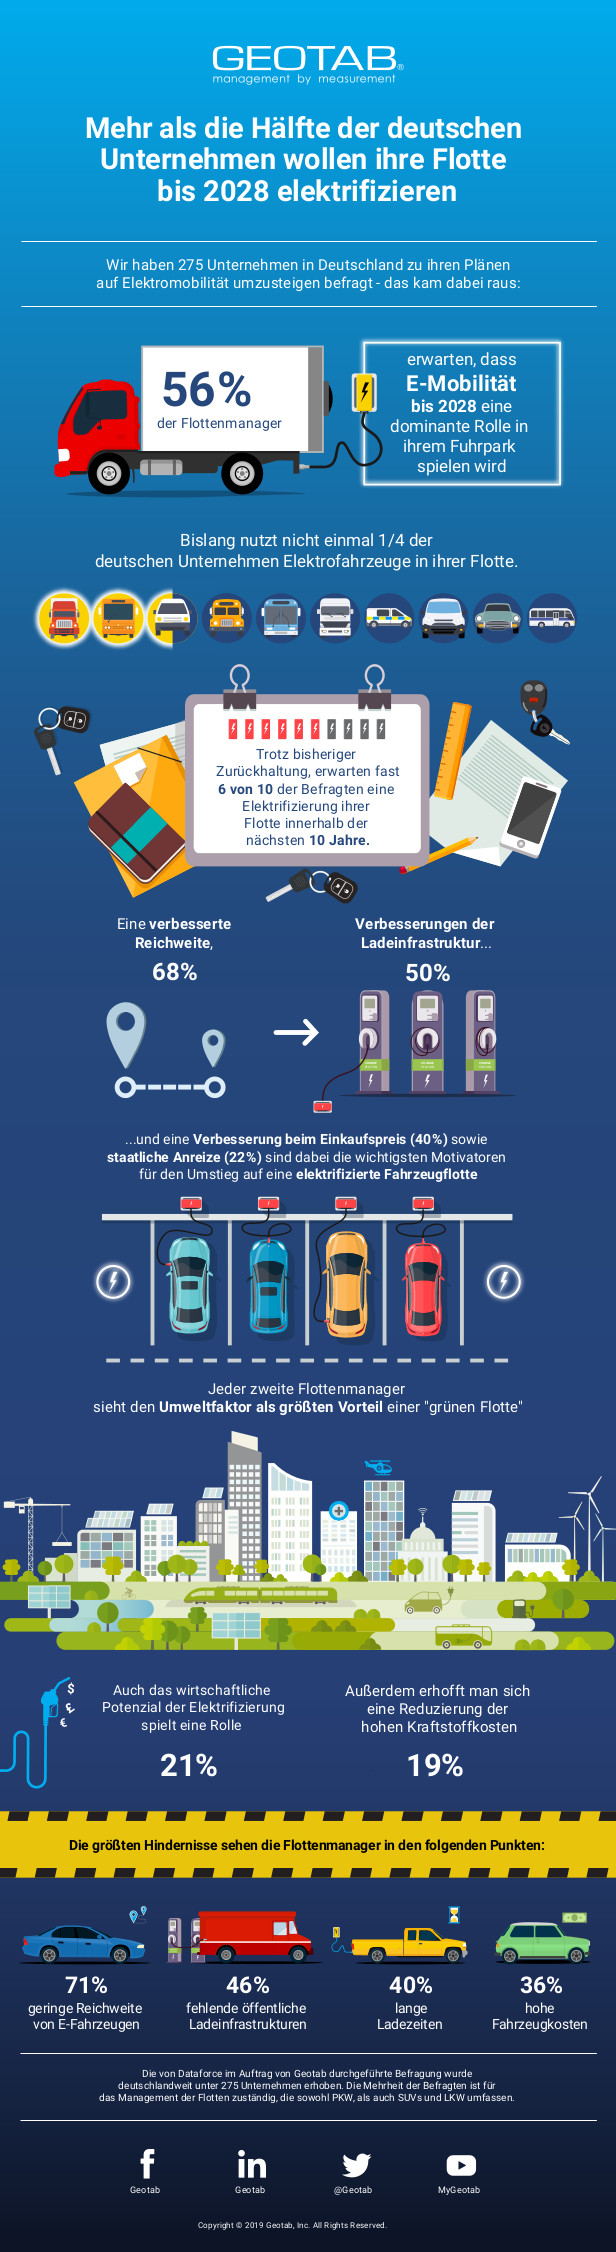 Geotab Infografik zu E-Fahrzeugen in Flotten